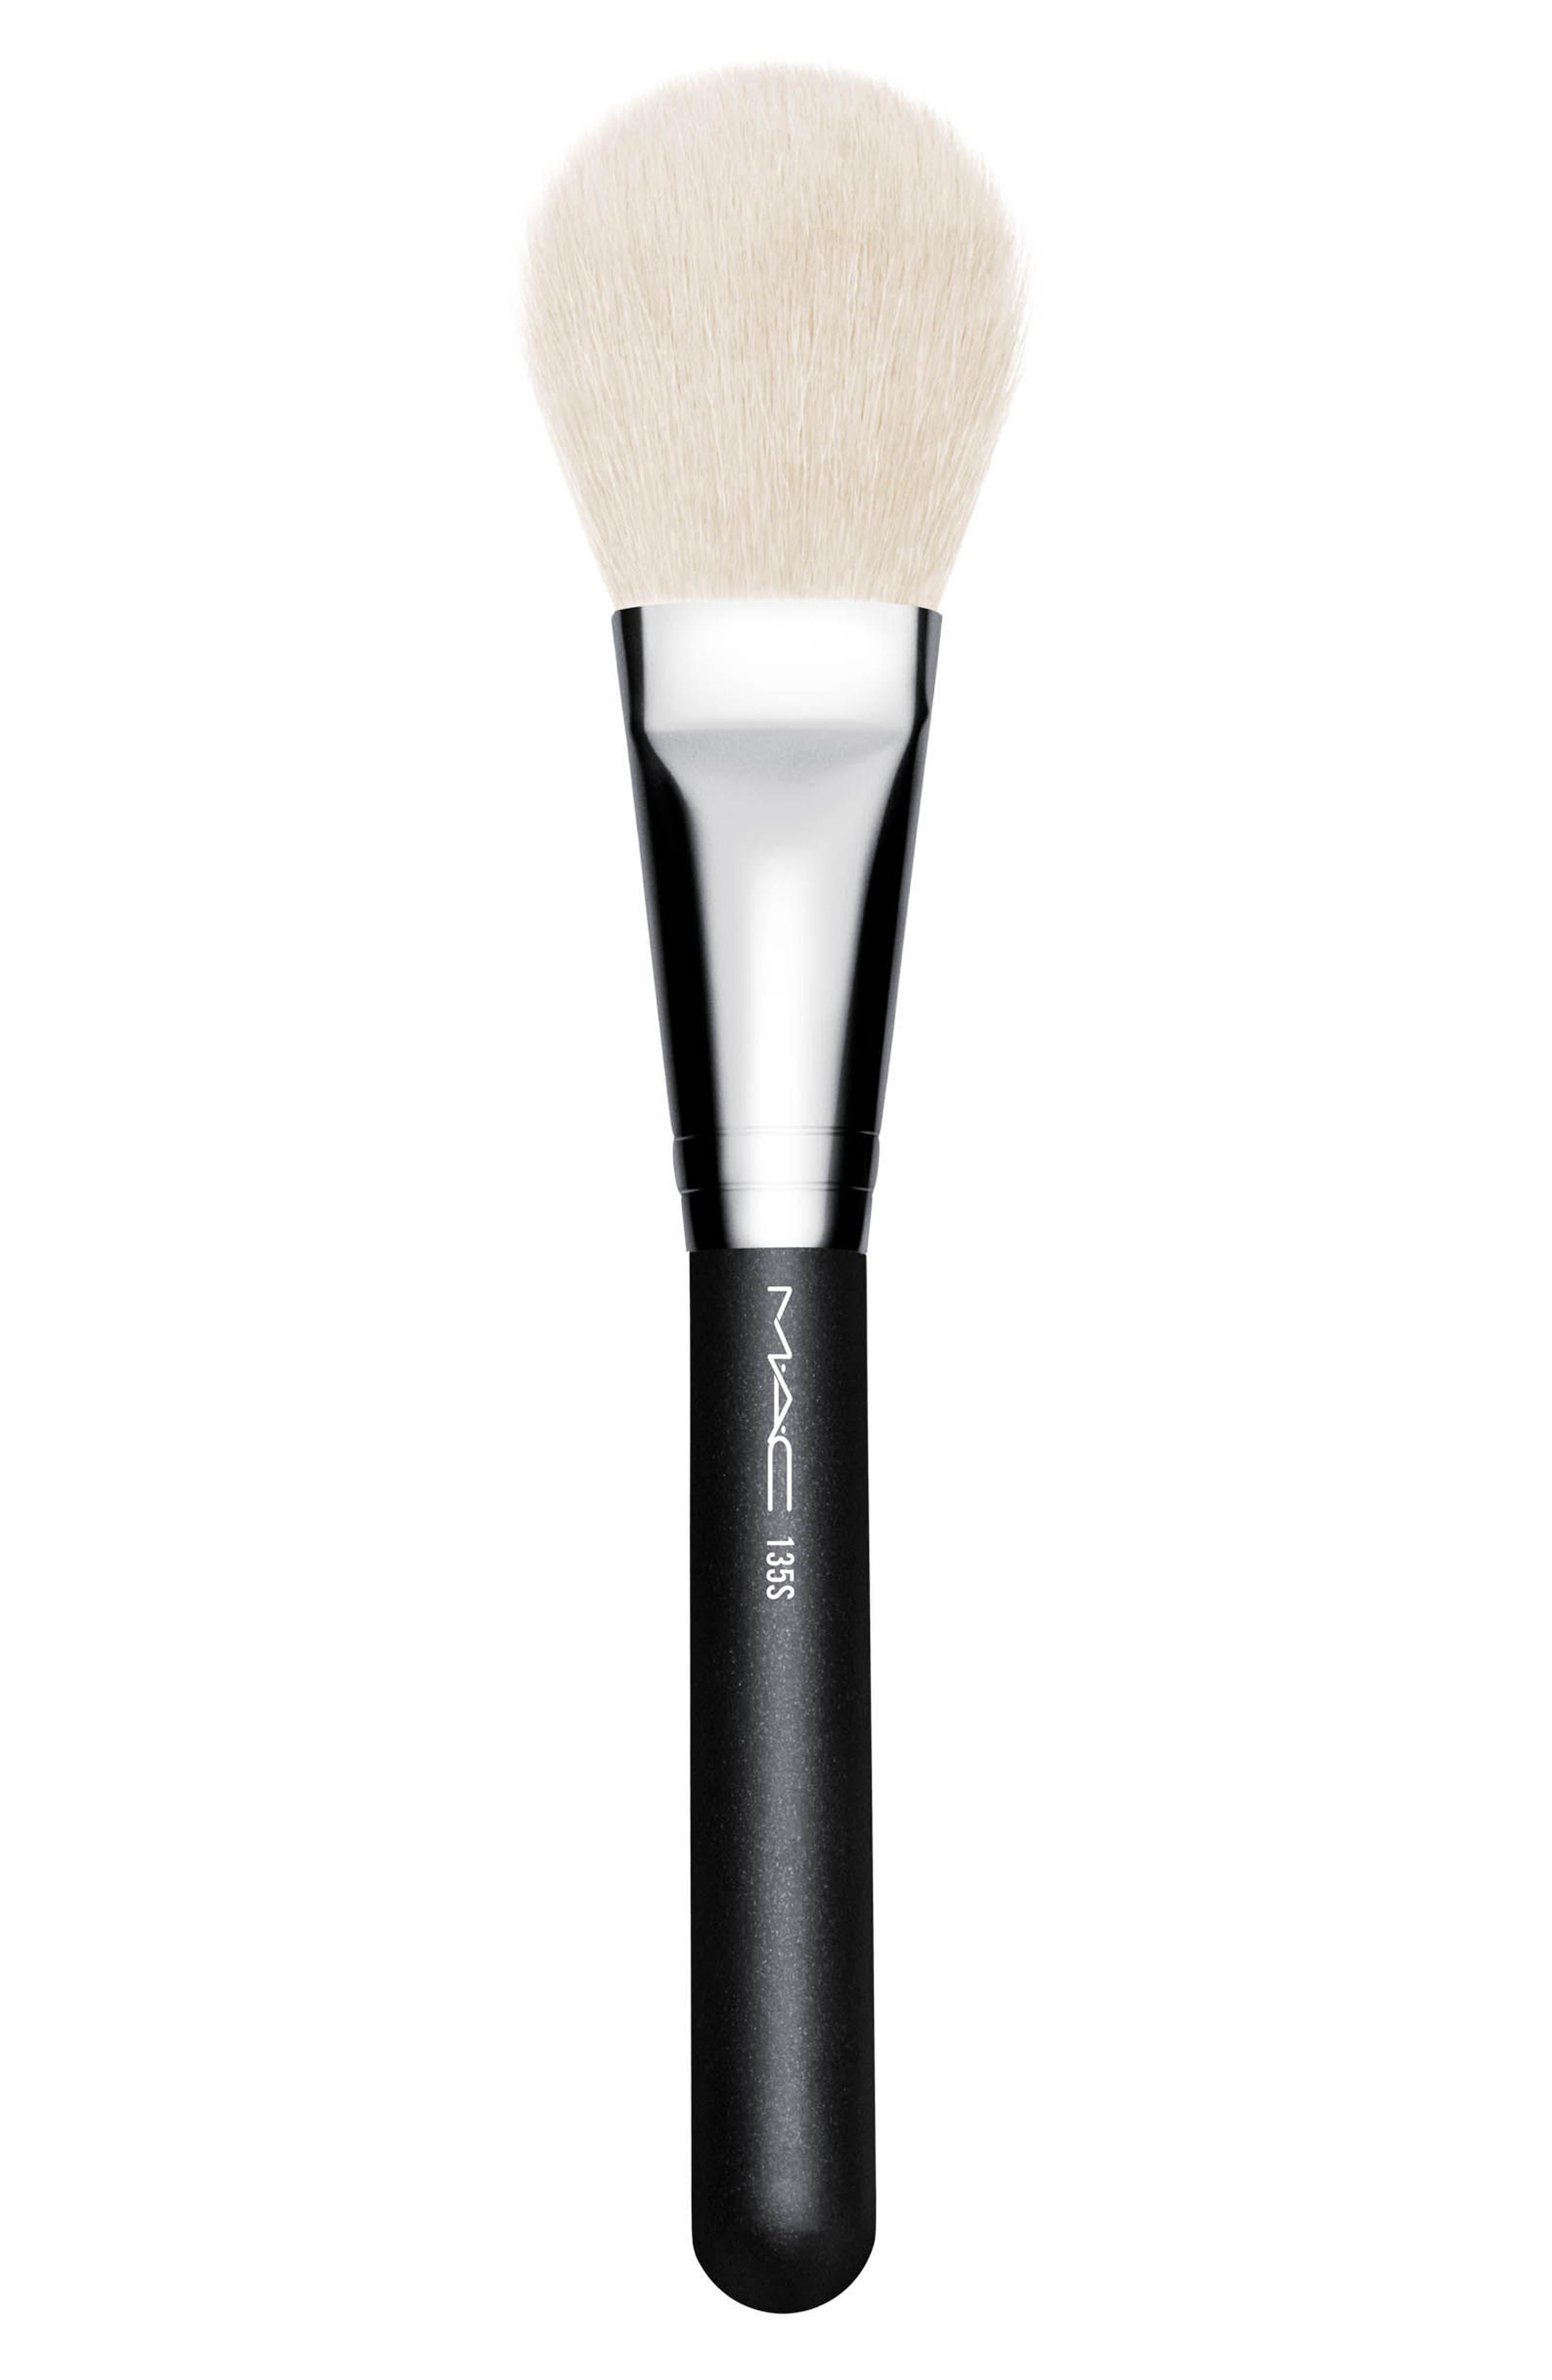 MAC COSMETICS, MAC 135S Synthetic Large Flat Powder Brush, Main thumbnail 1, color, 000